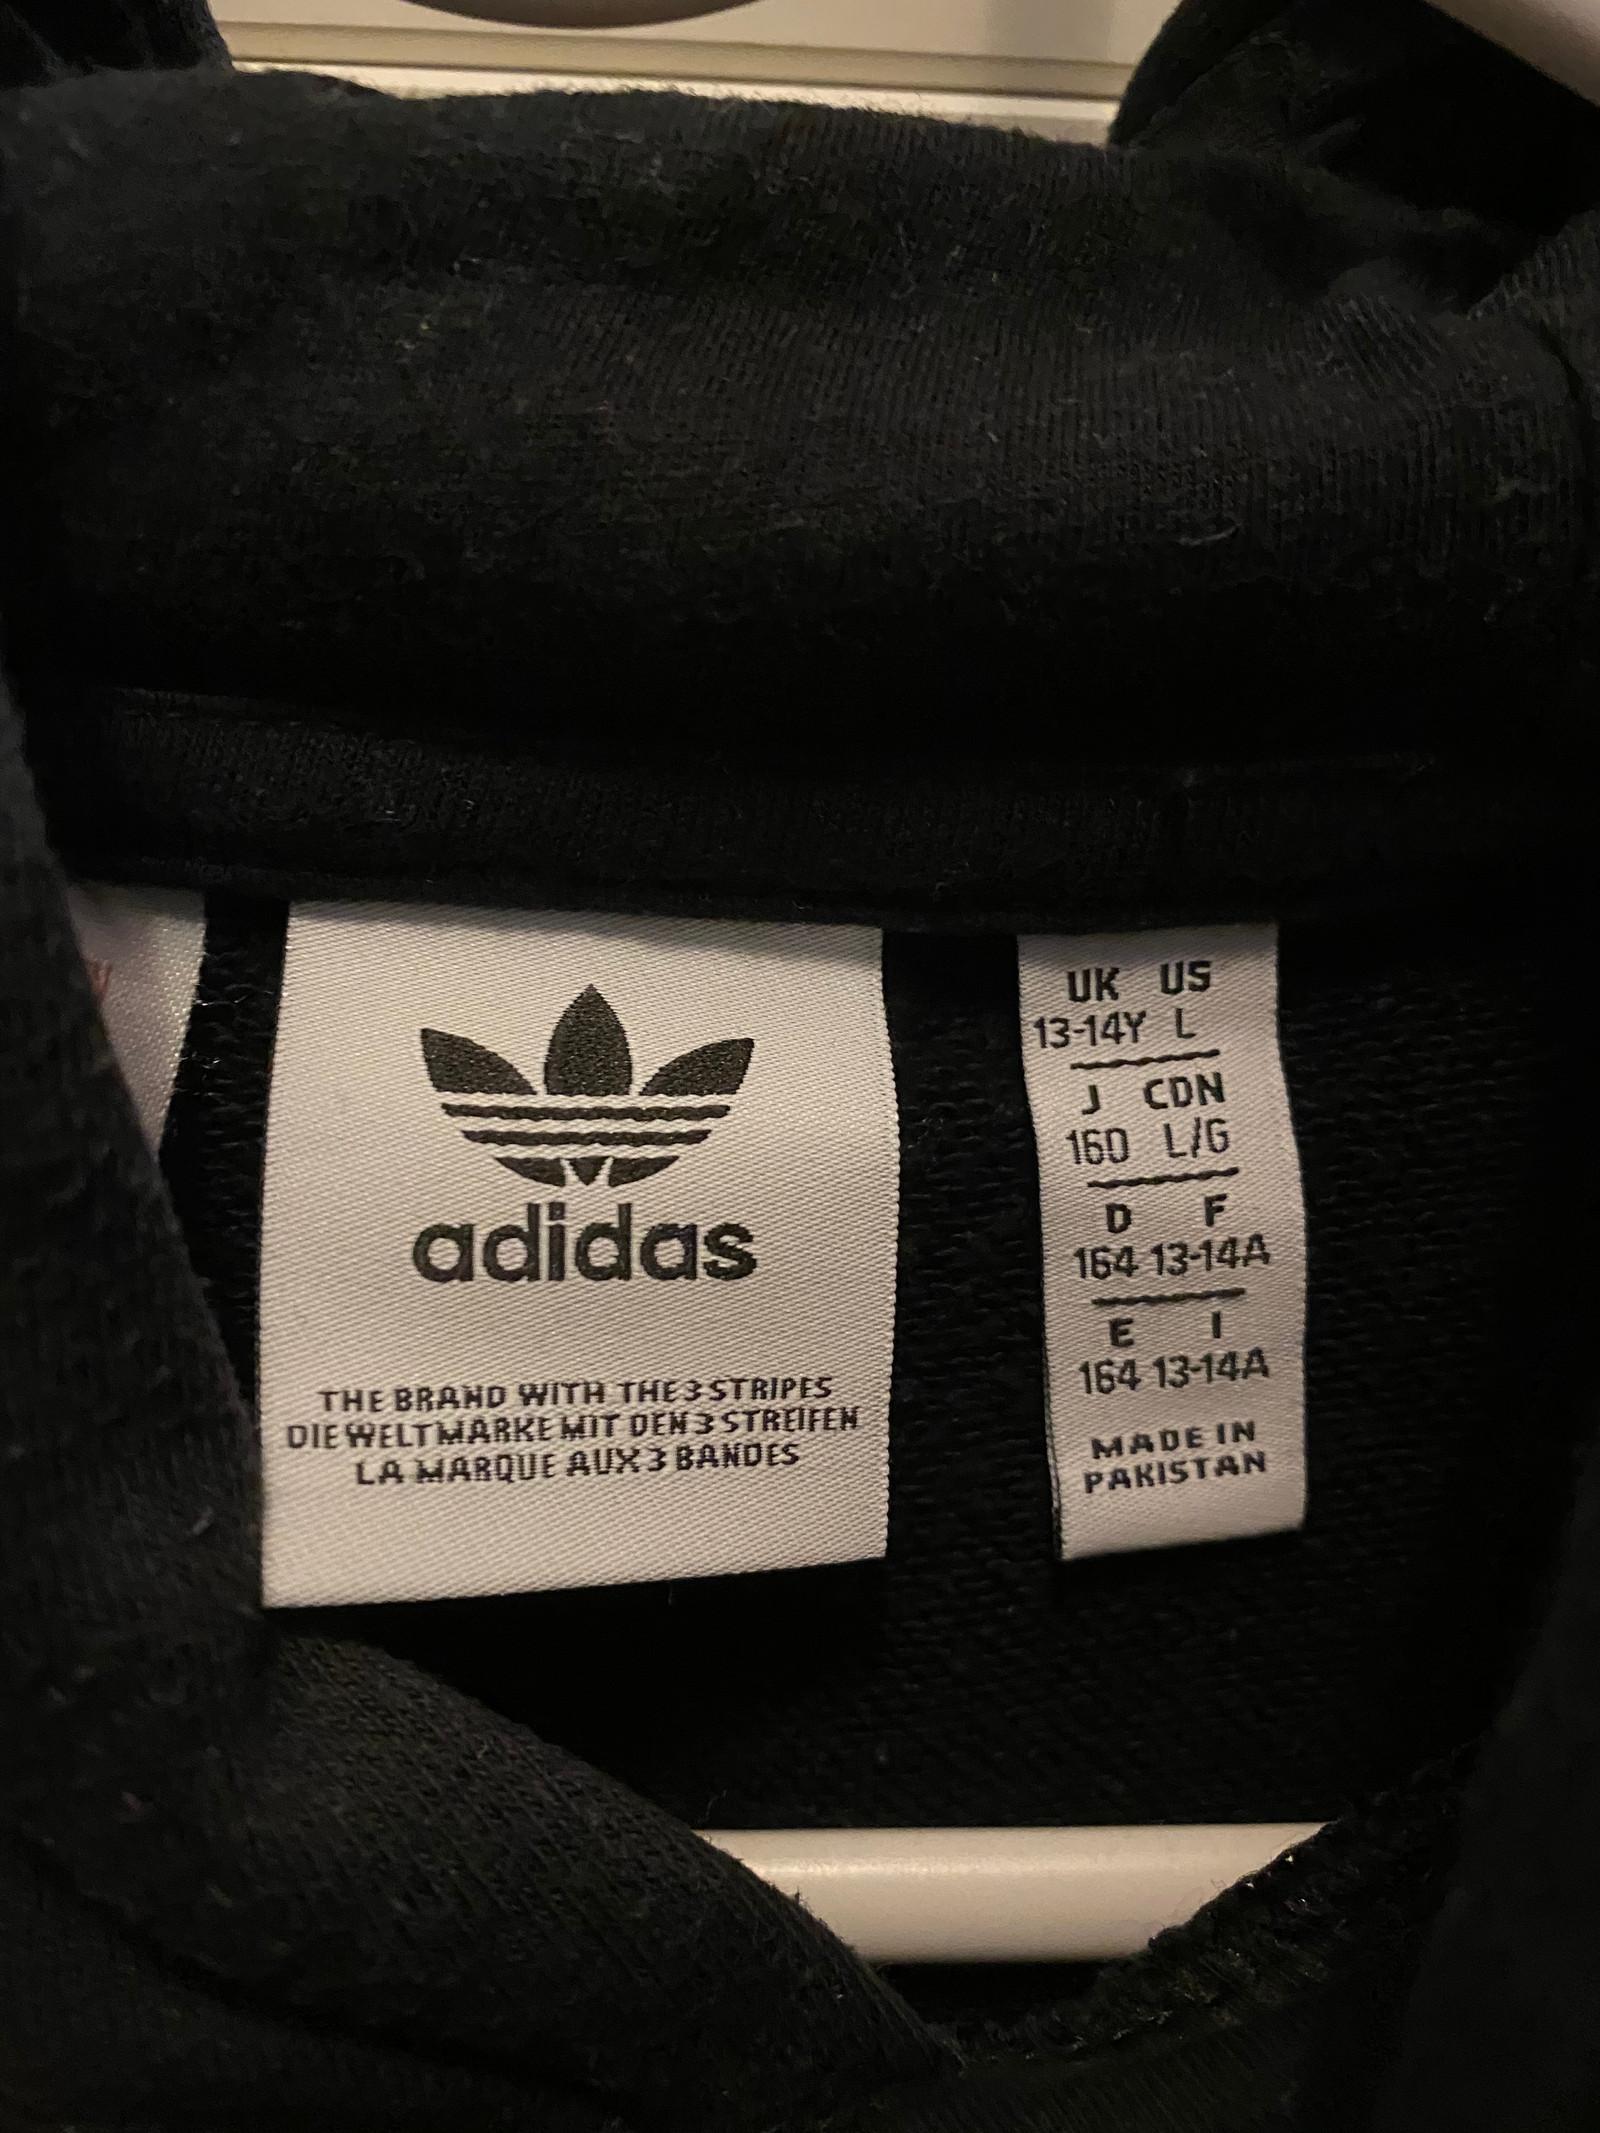 Adidas genser   FINN.no